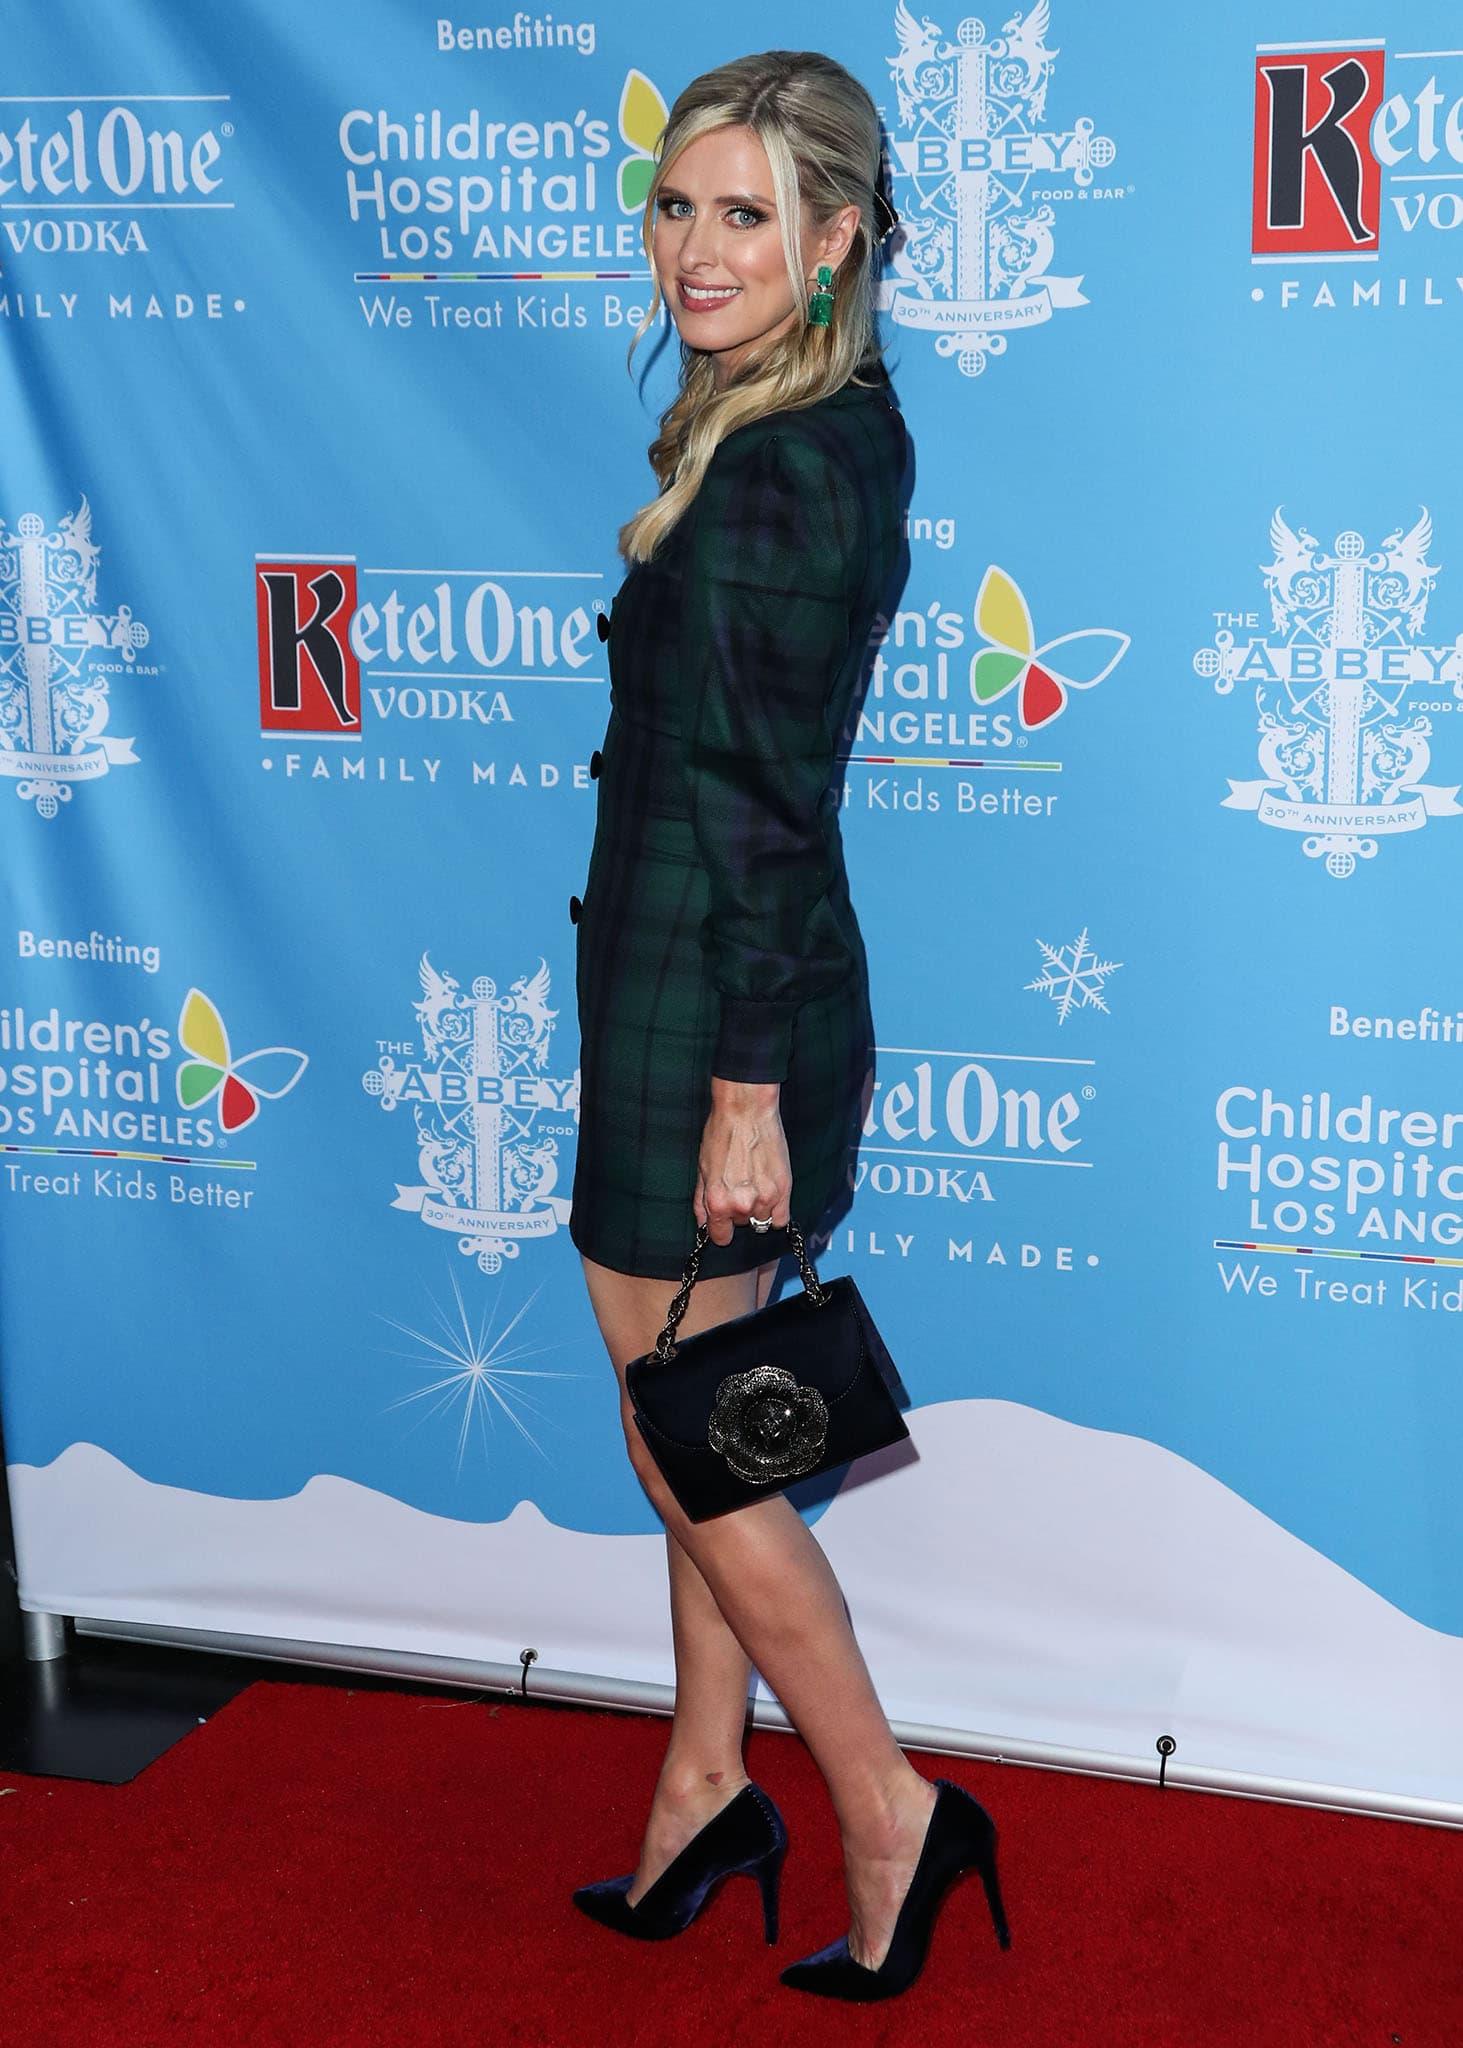 Nicky Hilton flaunts her slim legs in the plaid mini and carries a velvety Oscar de la Renta flower bag